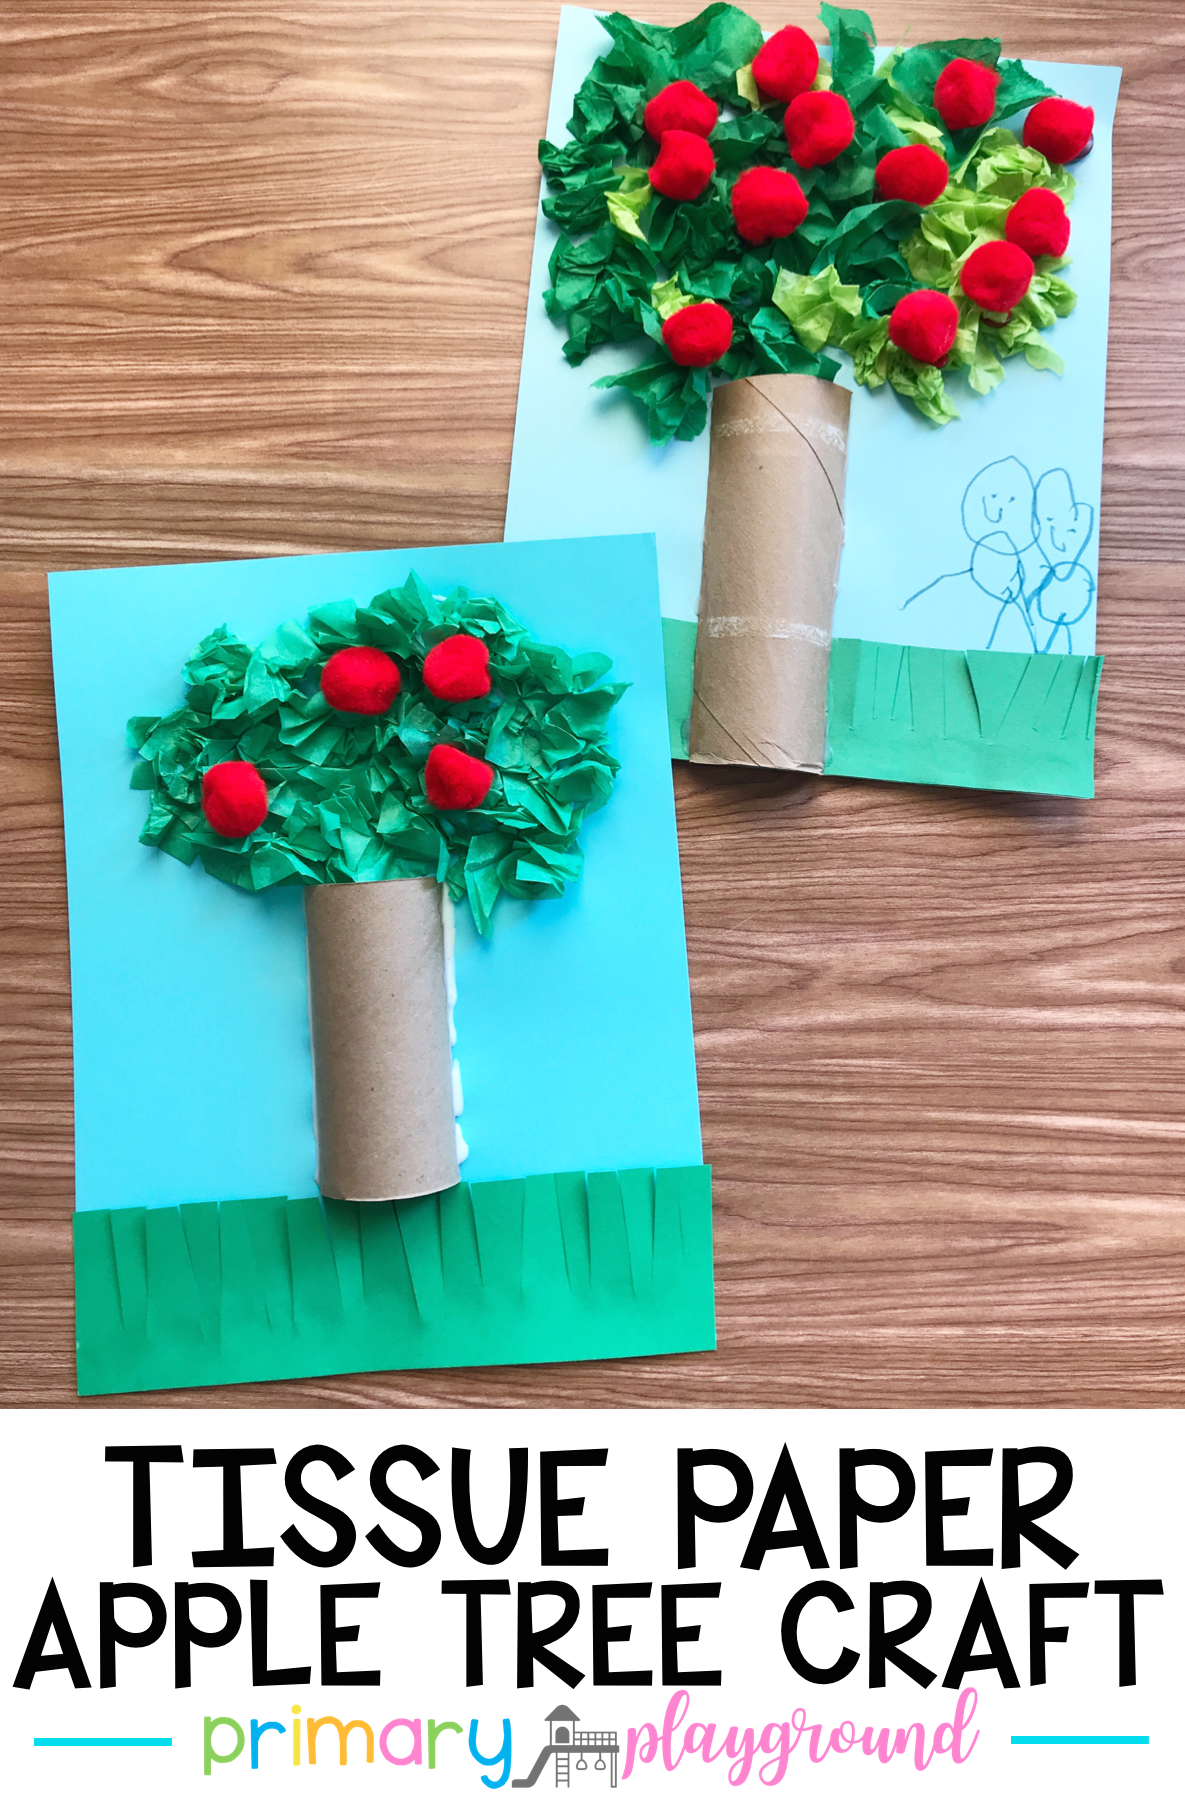 Tissue Paper Apple Tree Craft Applecraft Appletreecraft